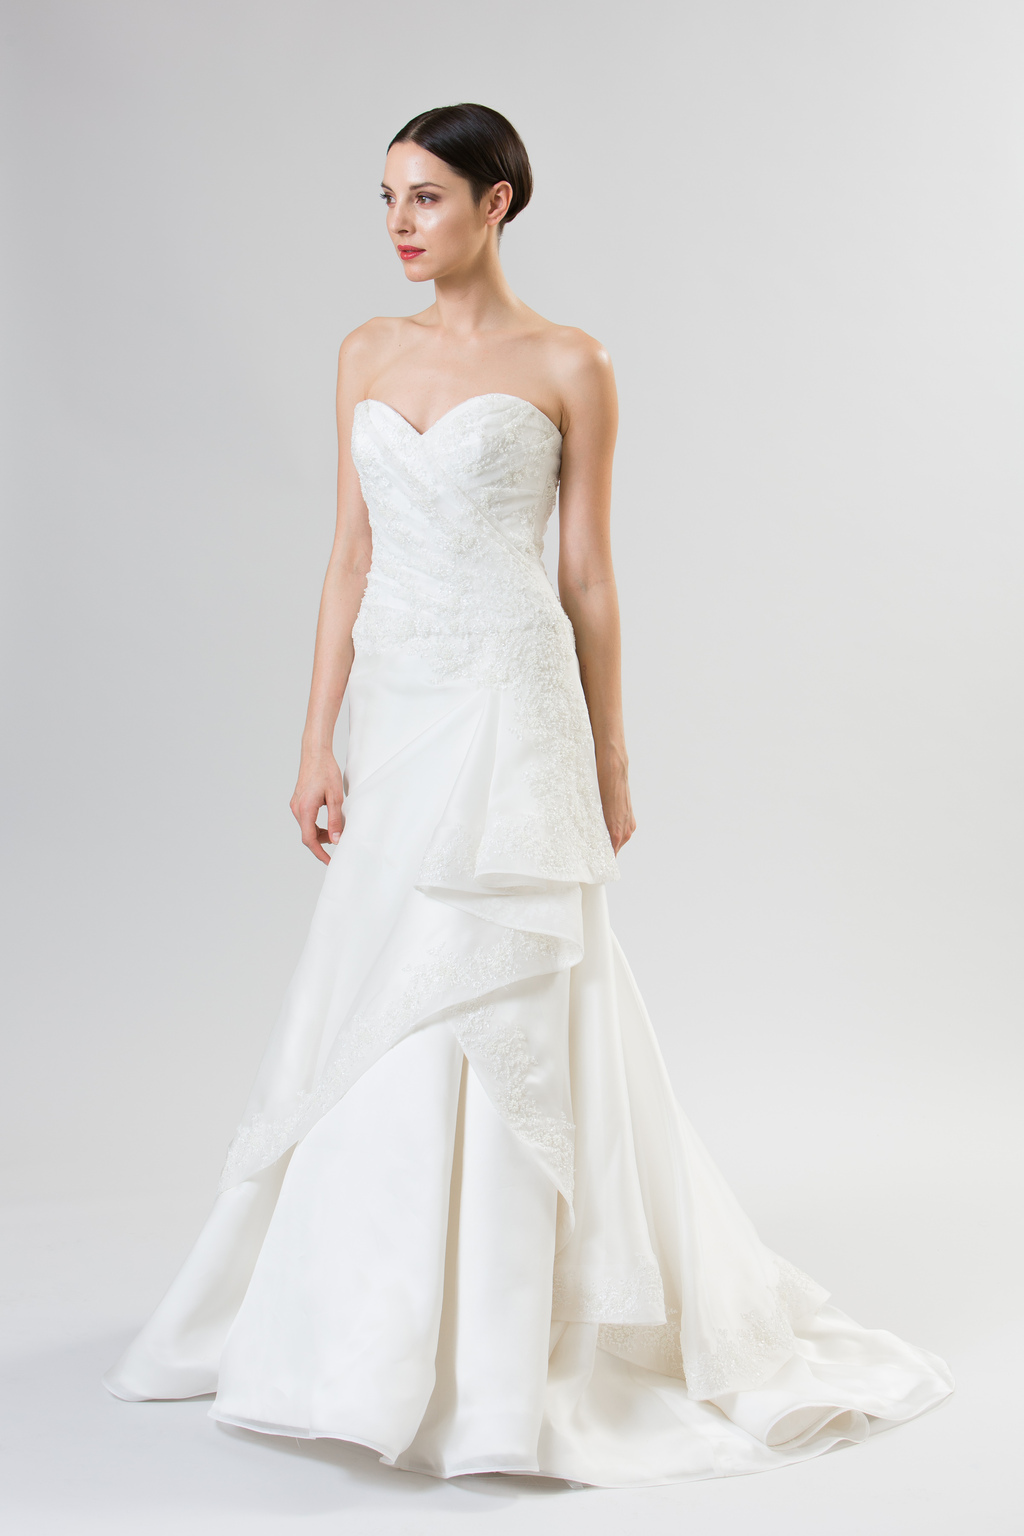 Junko-yoshioka-summer-spring-2014-wedding-dress-linzer_1.full